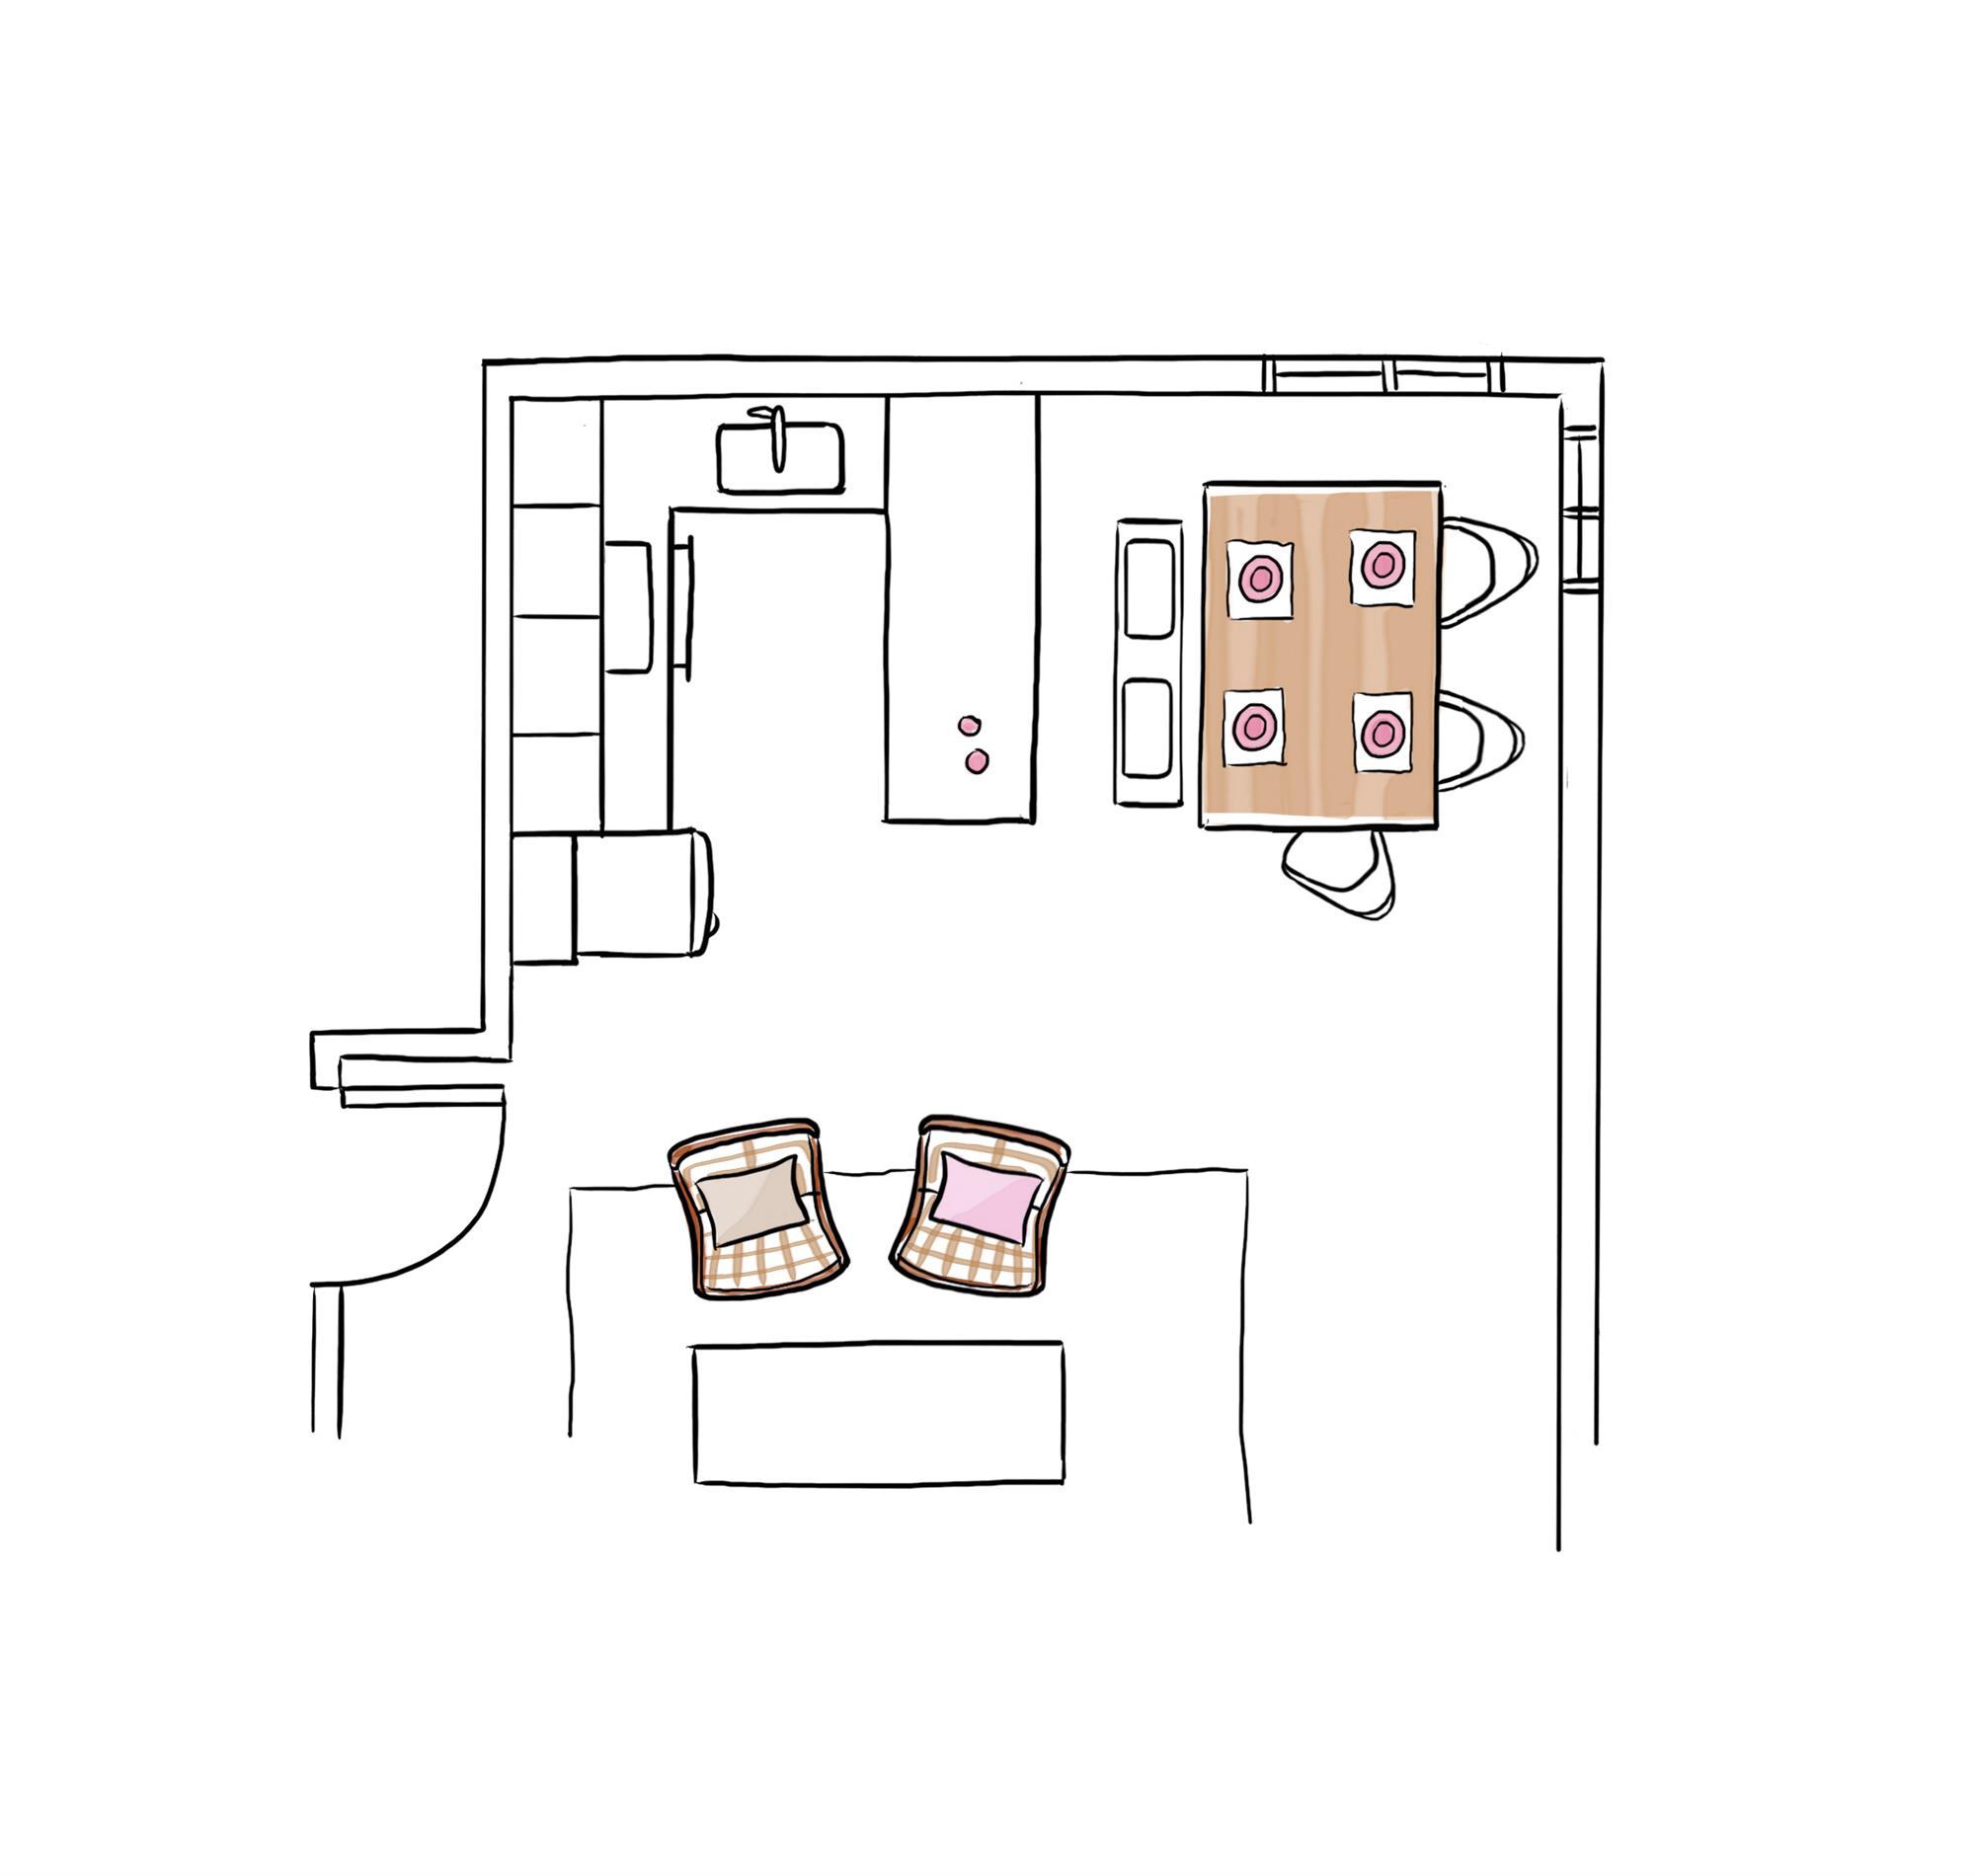 C mo hacer un plano a escala paso a paso for Como dibujar un plano de una casa